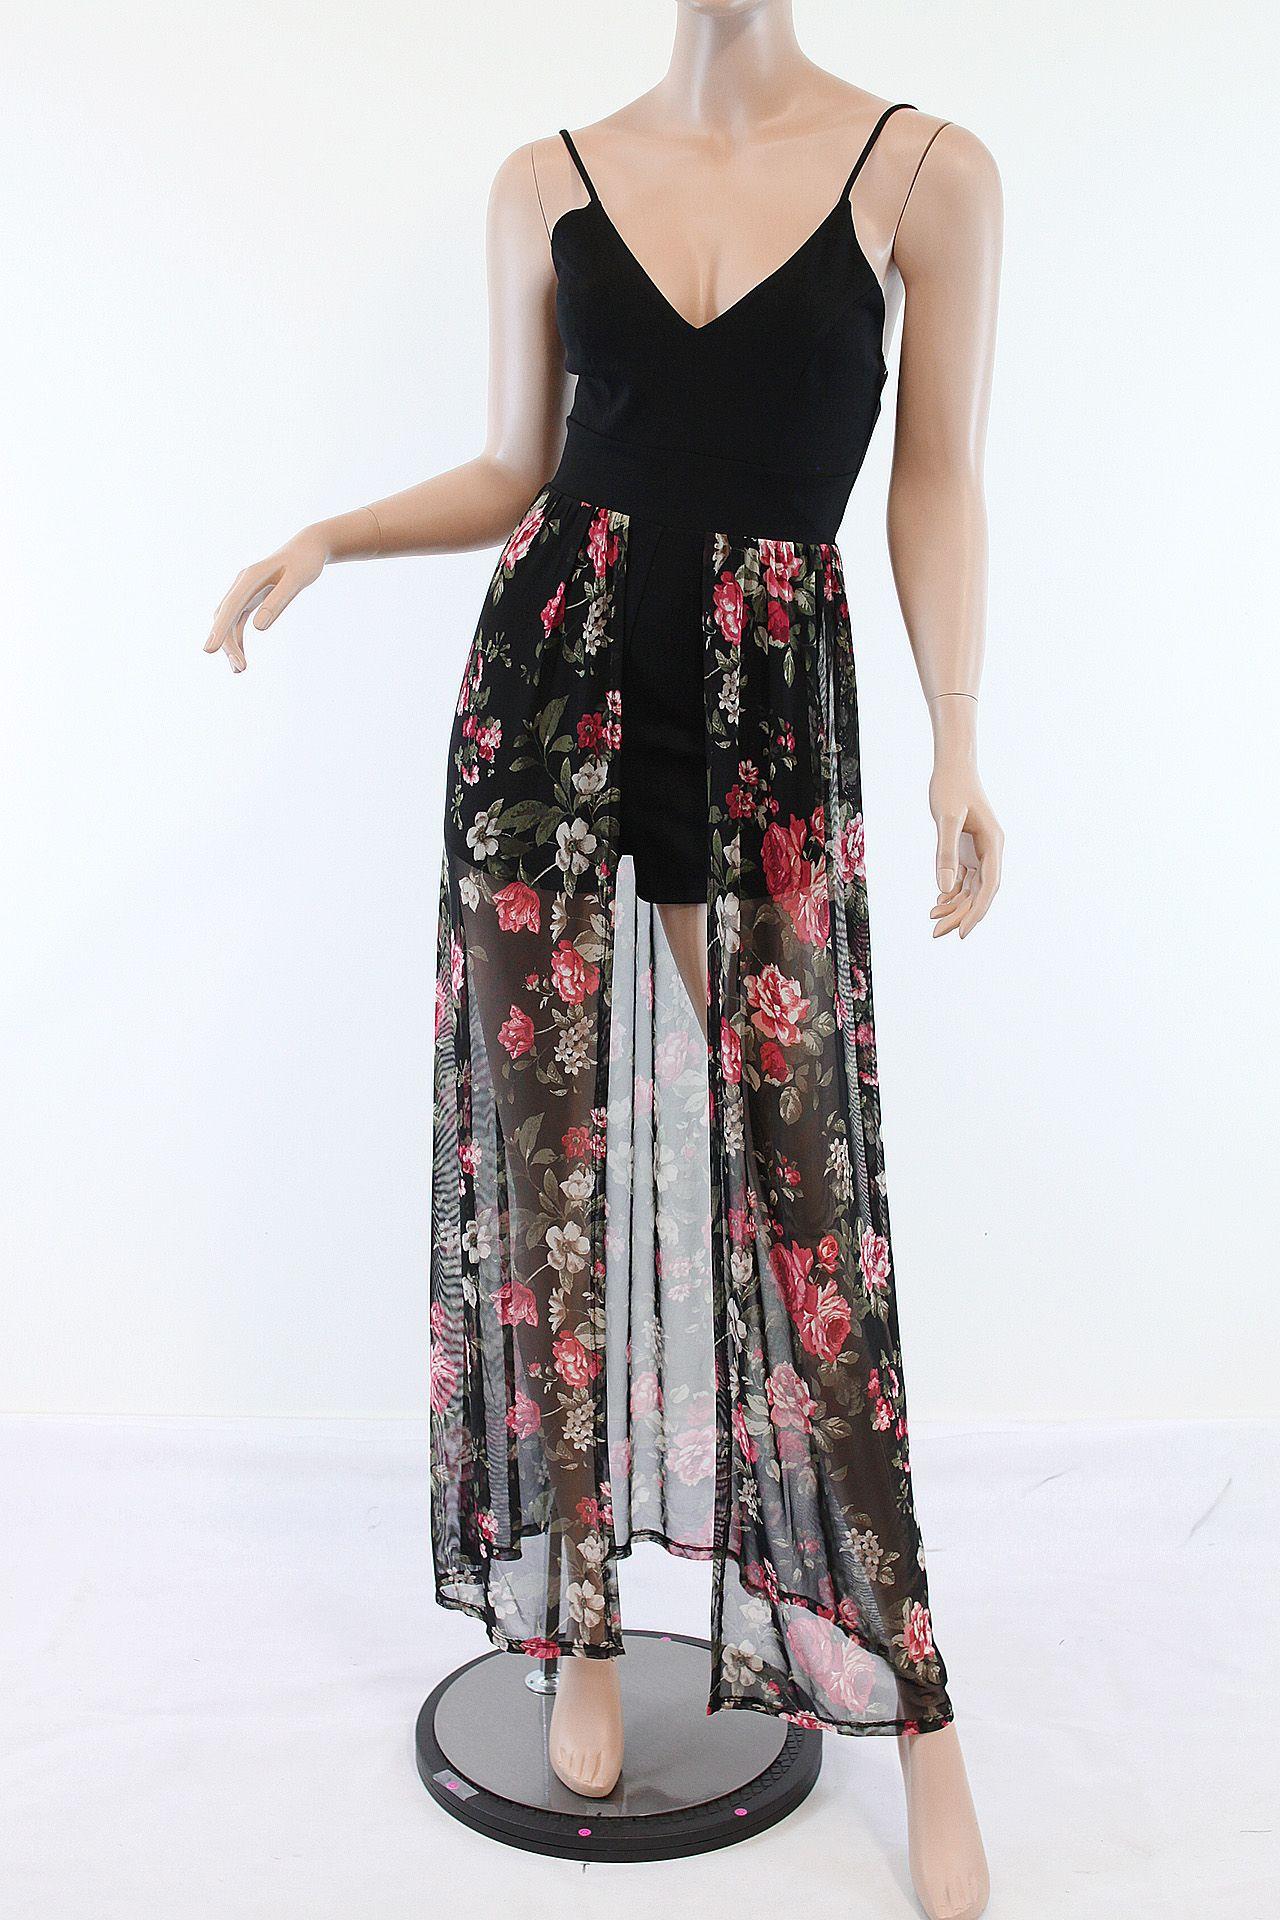 Floral print romper mesh long dress plus size lafestar